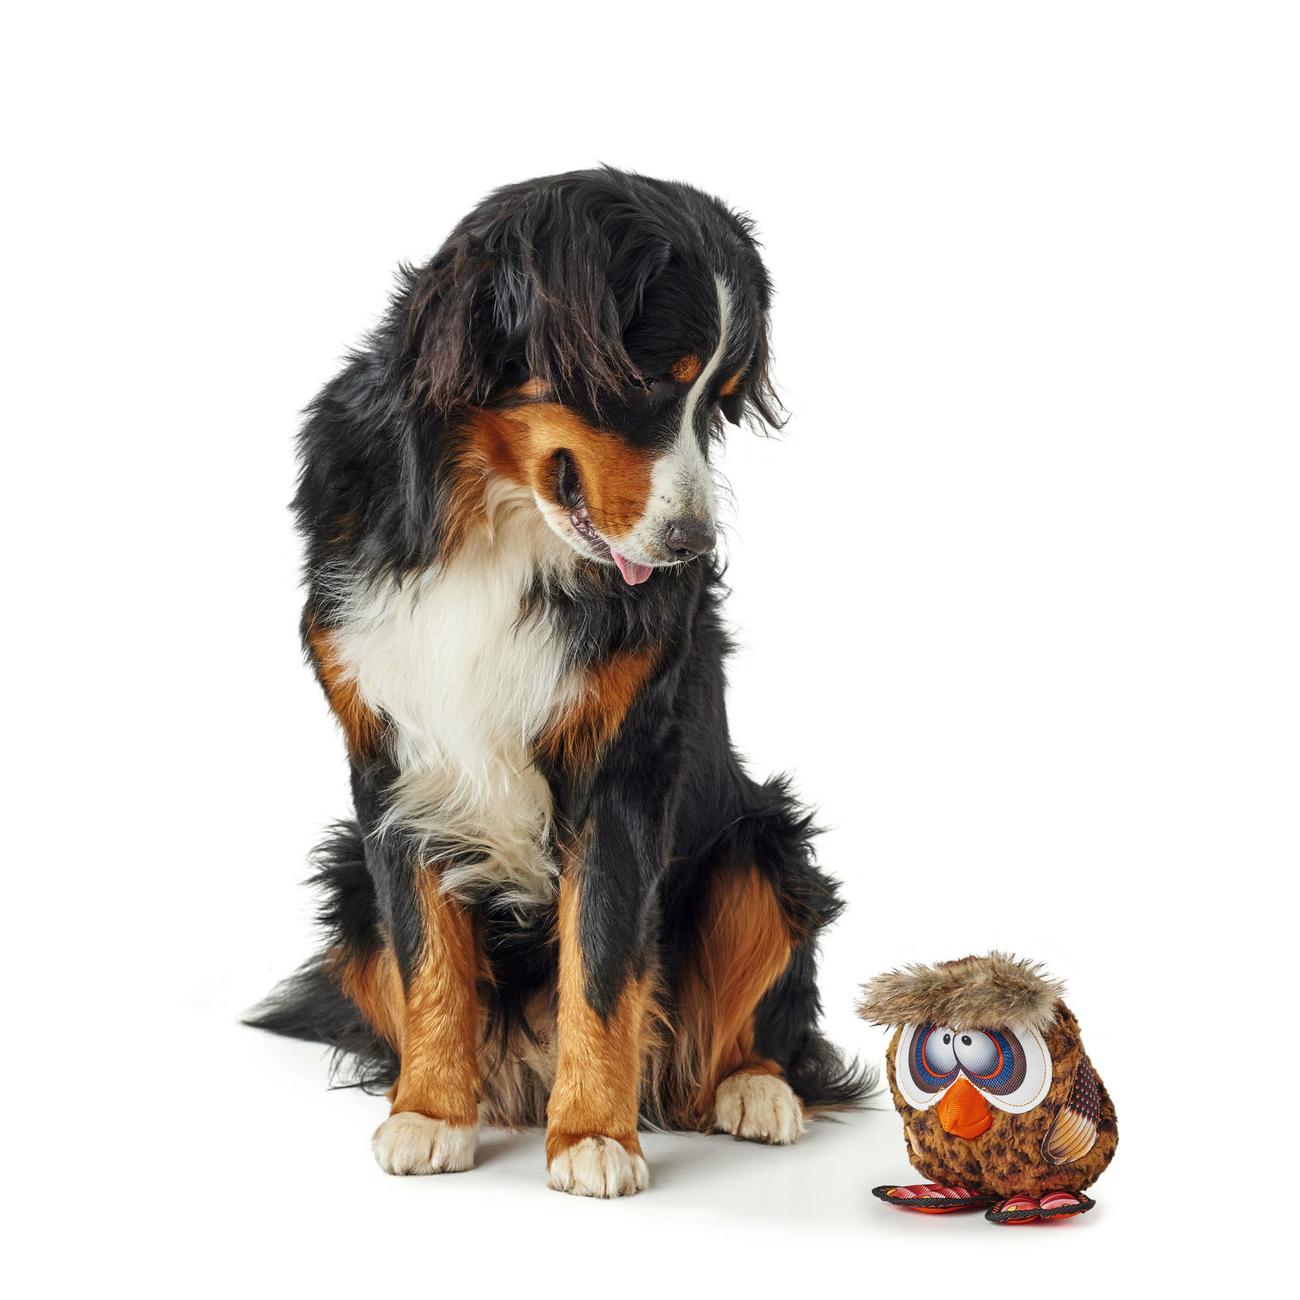 Hunter Hundespielzeug Gurupi 65725, Bild 7